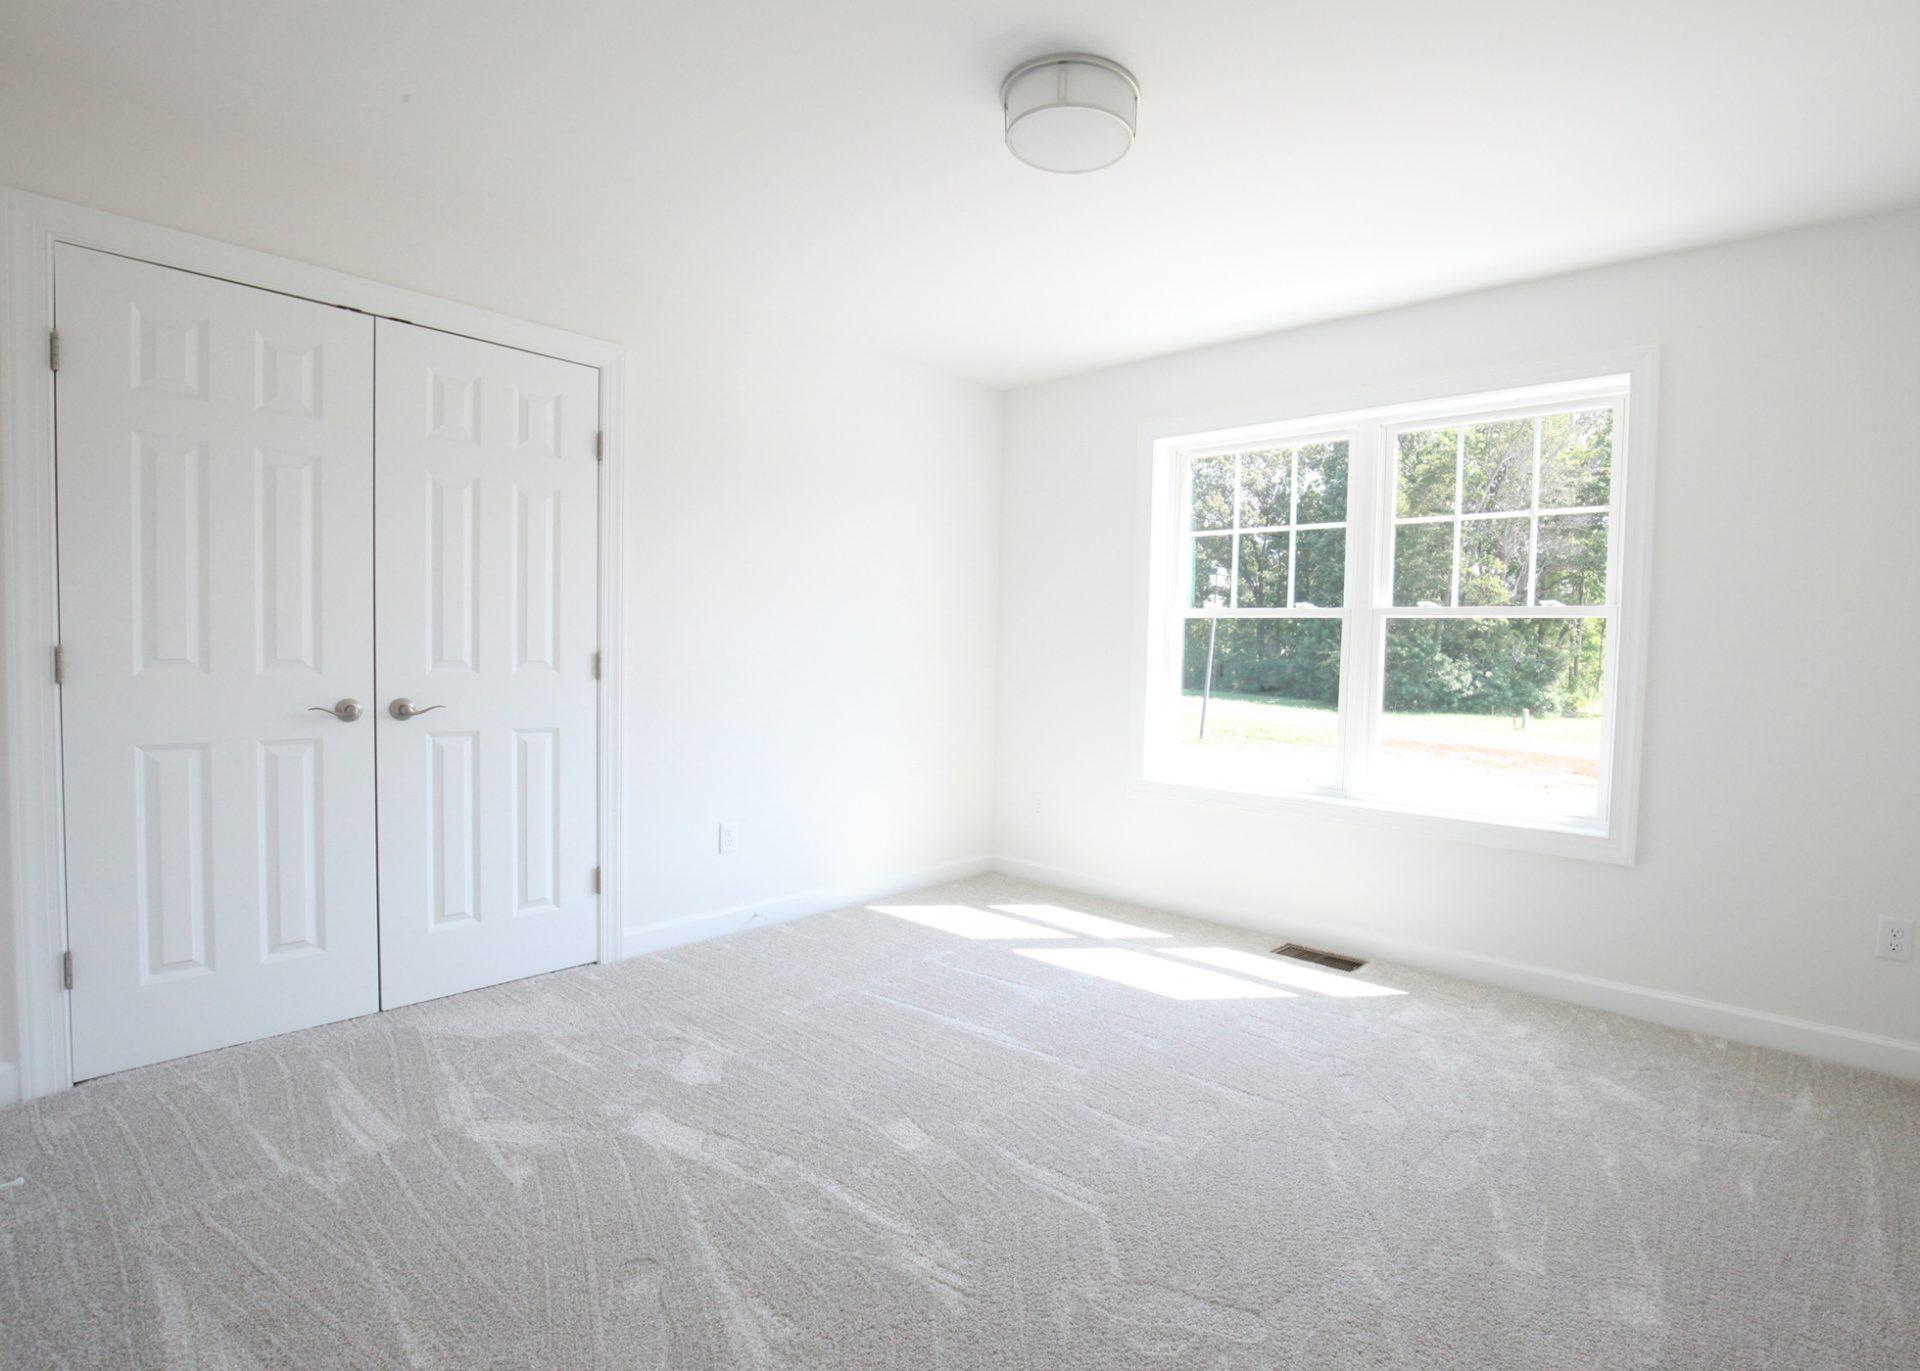 Interior design photo inside The Waverly